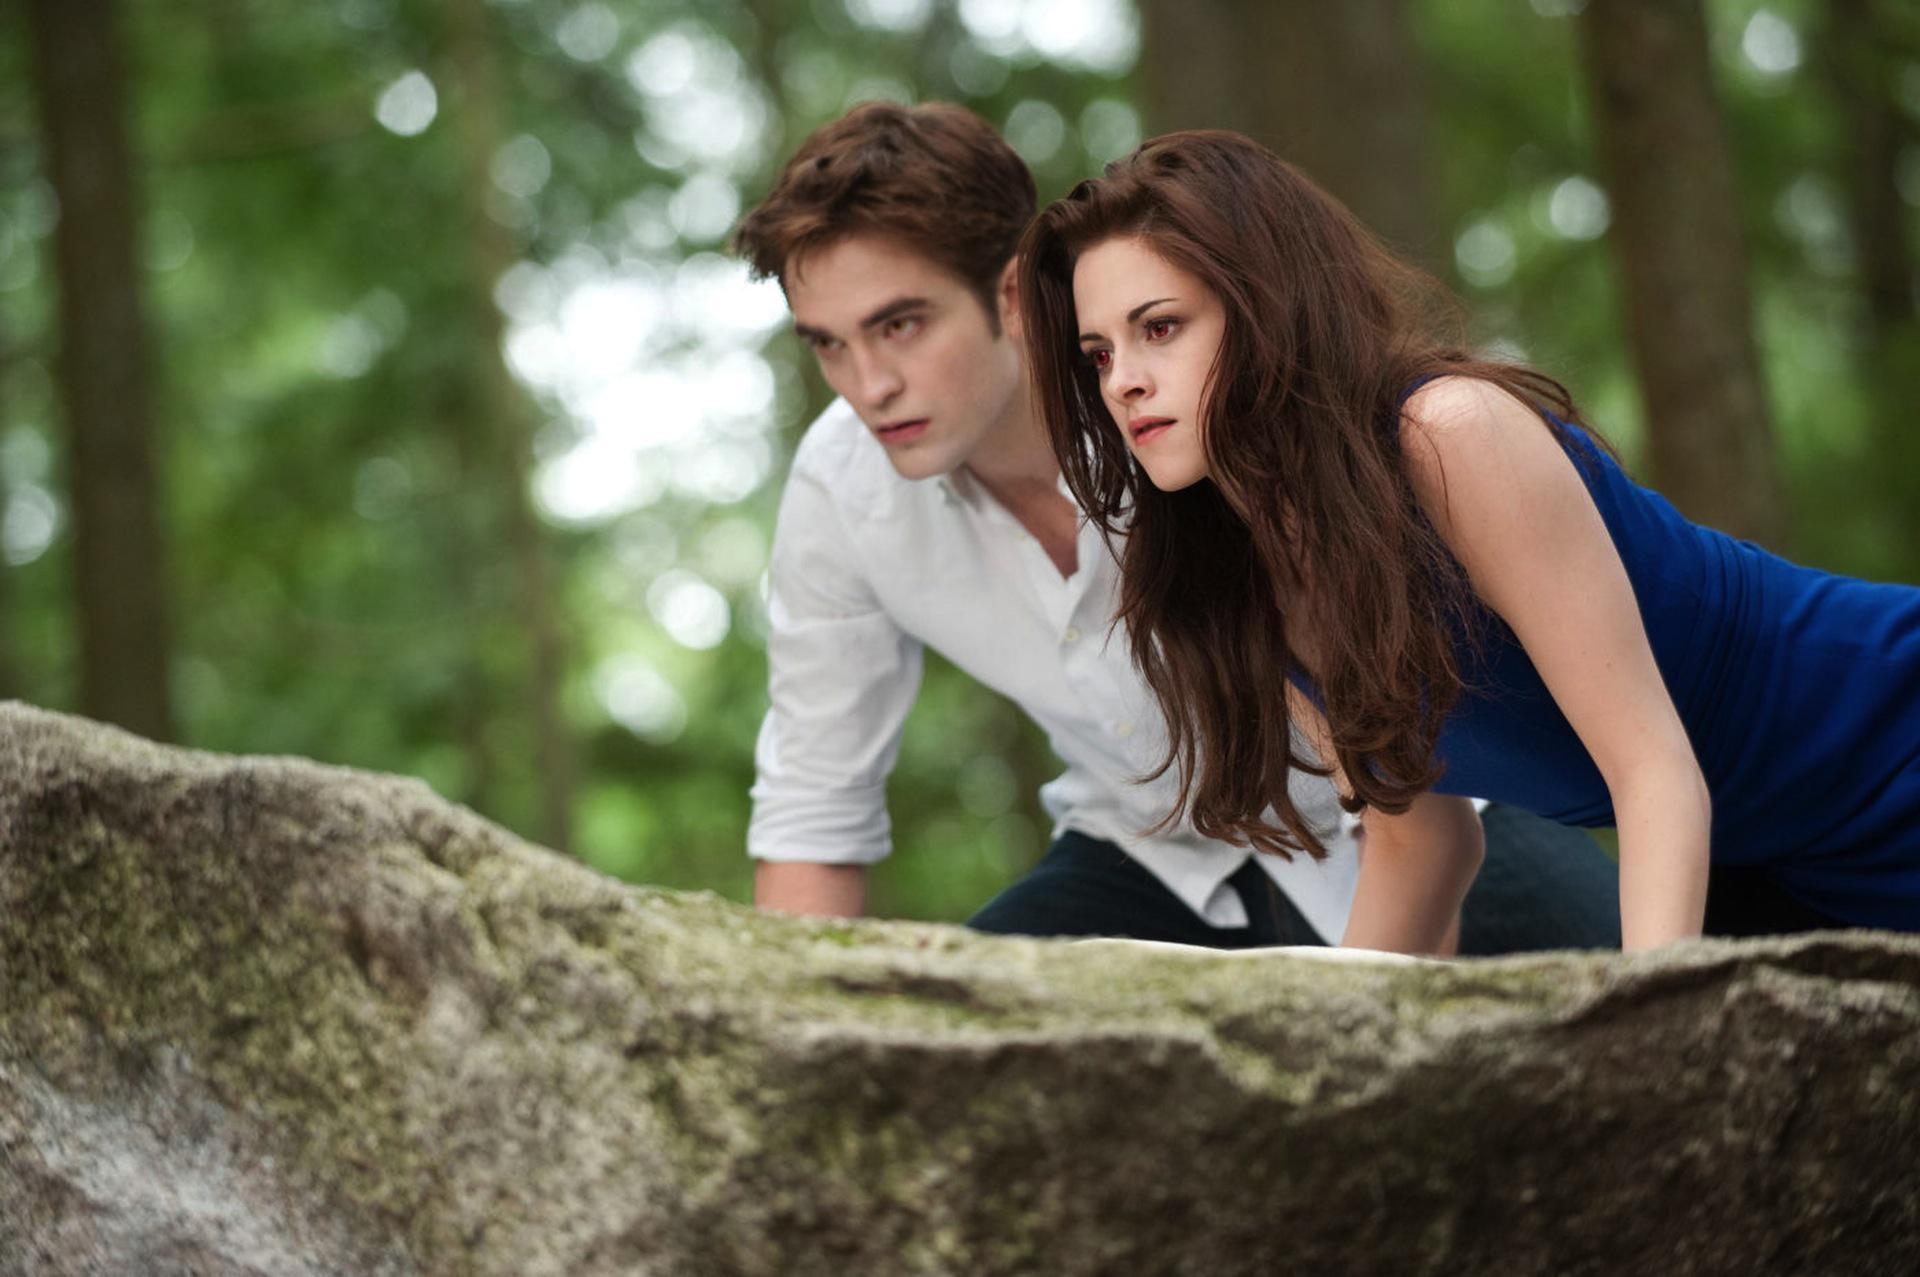 8 Bizarre Twilight fan fiction stories we want turned into short